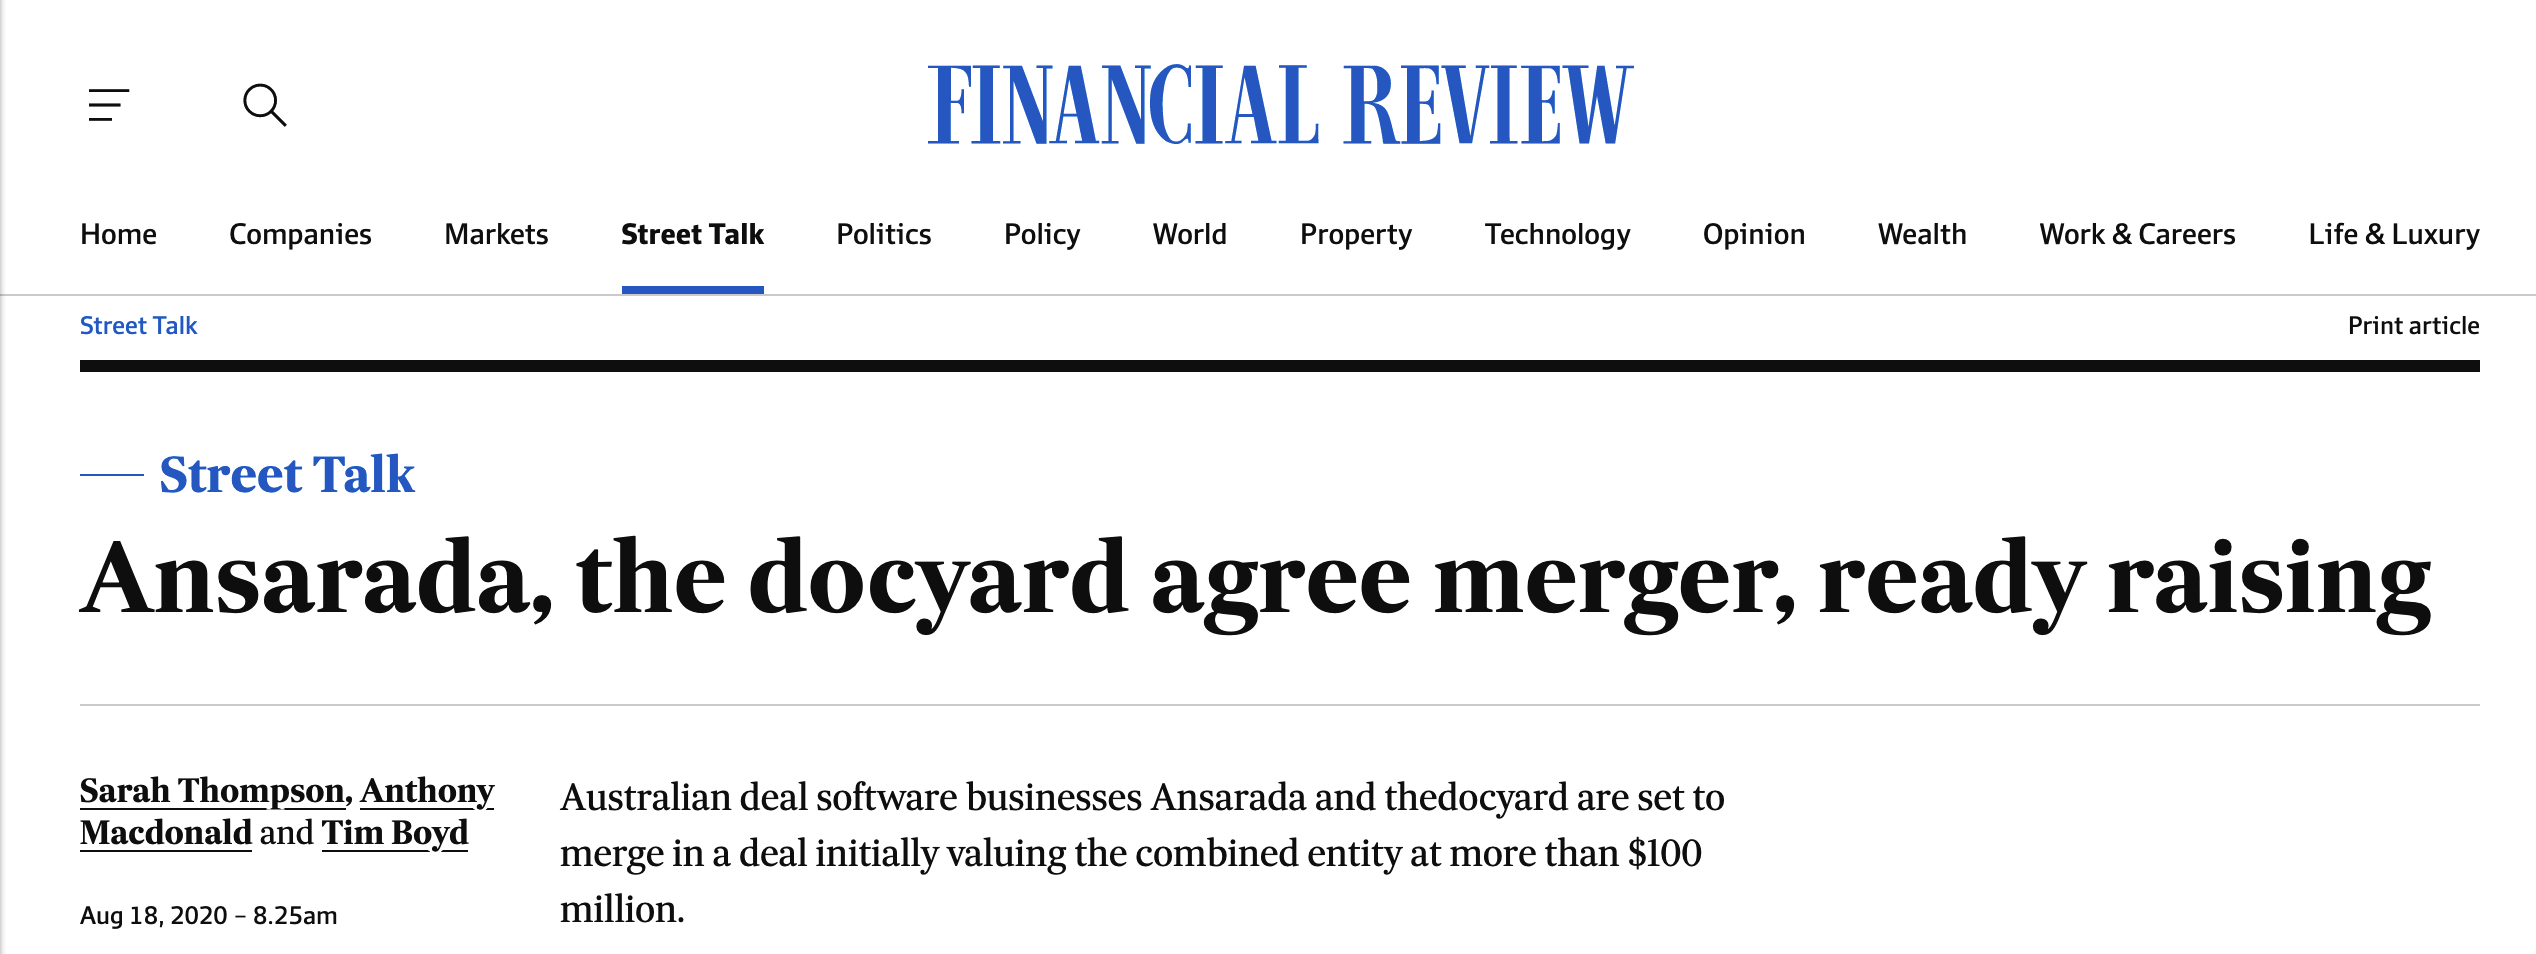 afr_ansarada_the_docyard_agree_merger_ready_raising_barclay_pearce_capital